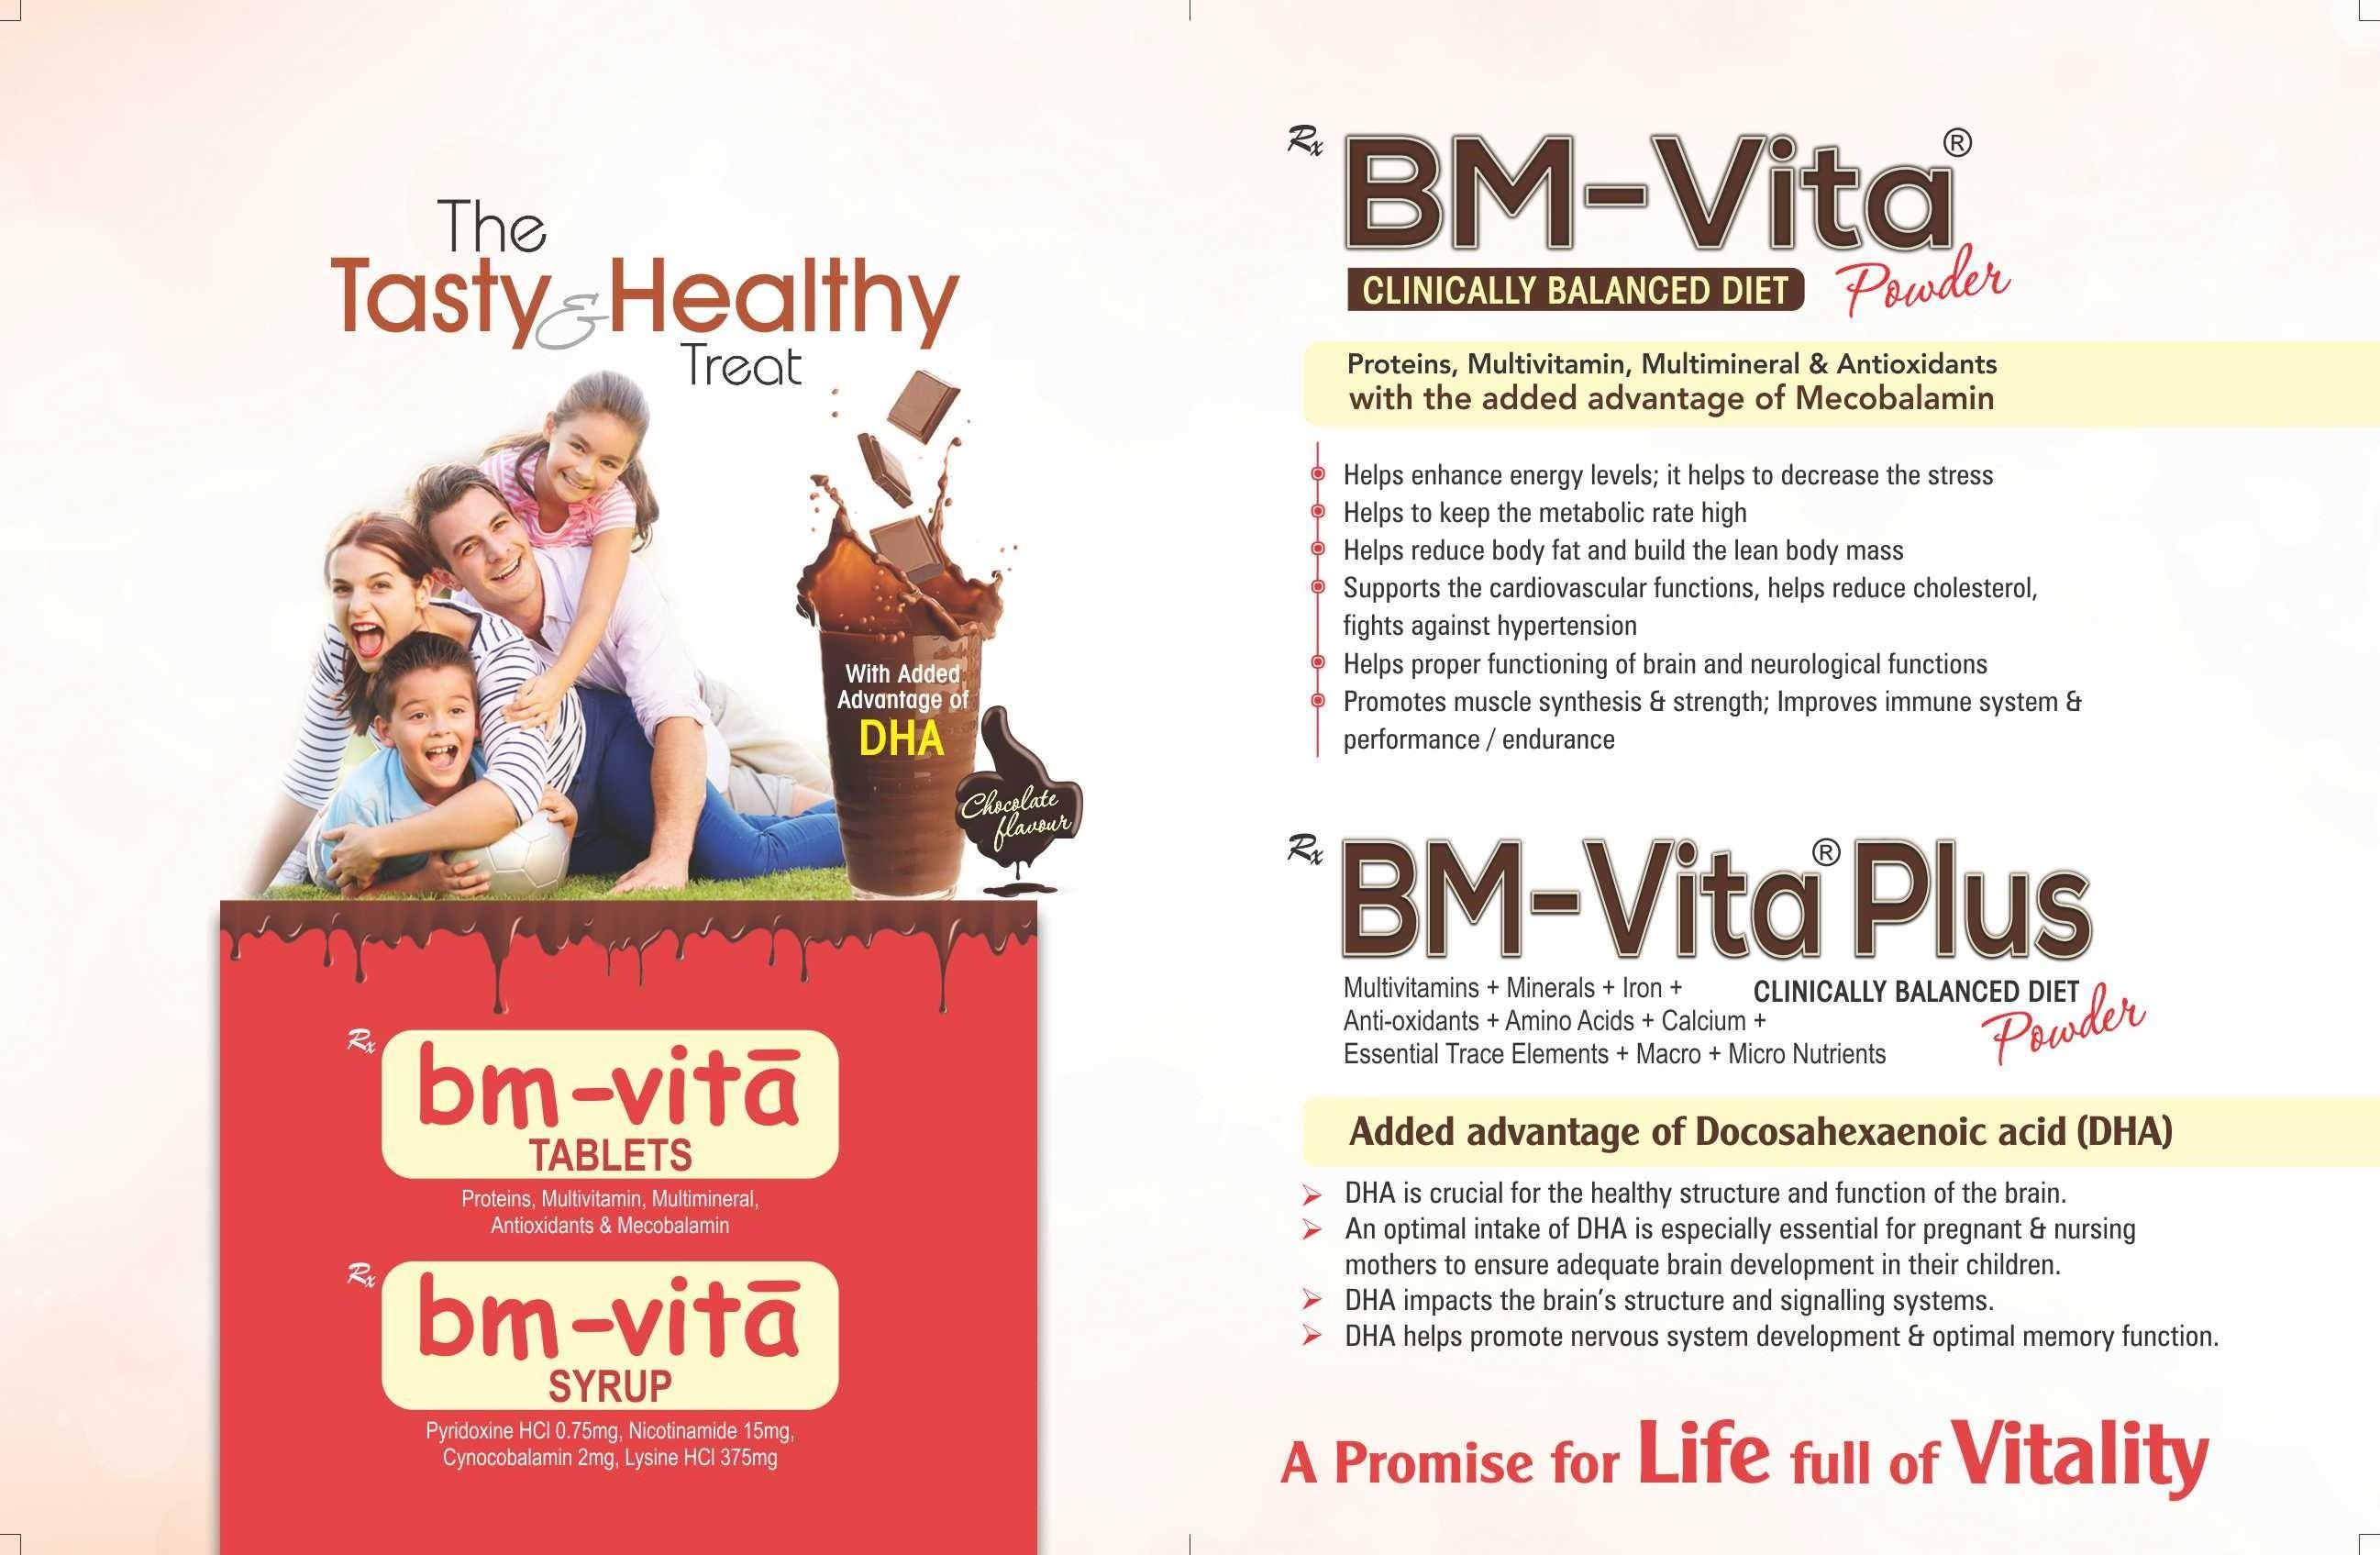 BM-Vita